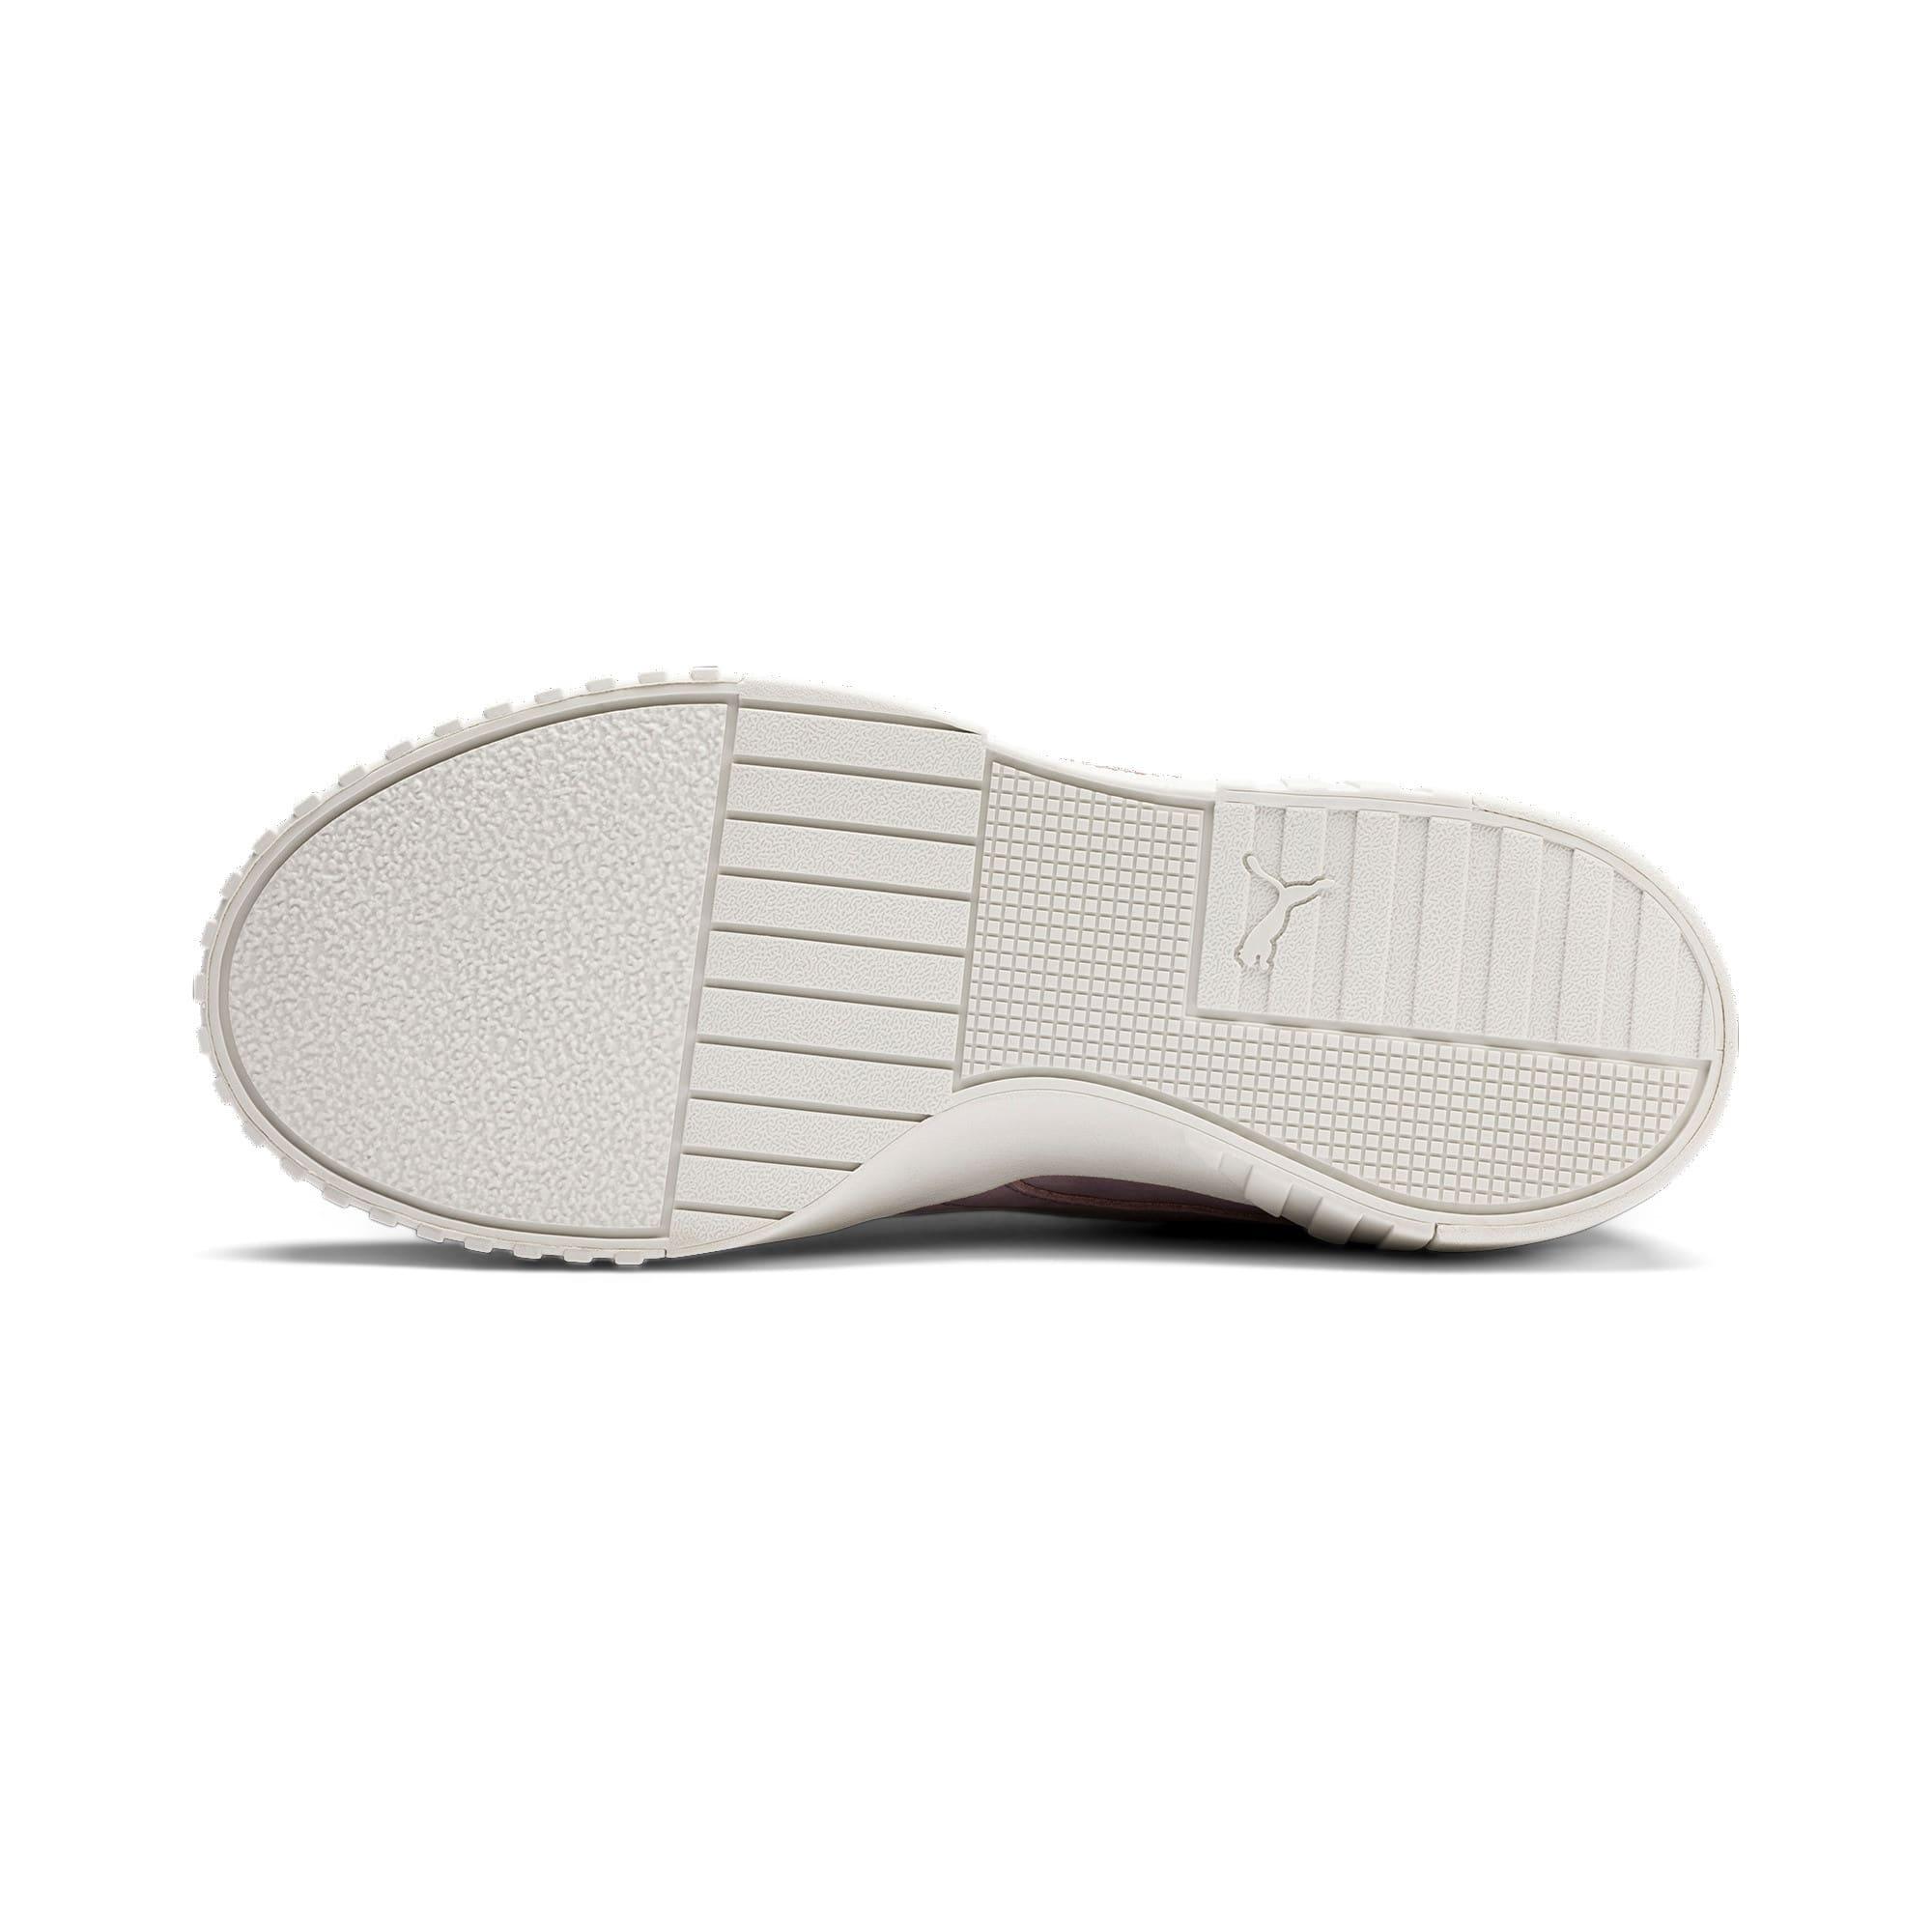 Thumbnail 6 of Cali Nubuck Women's Sneakers, Elderberry, medium